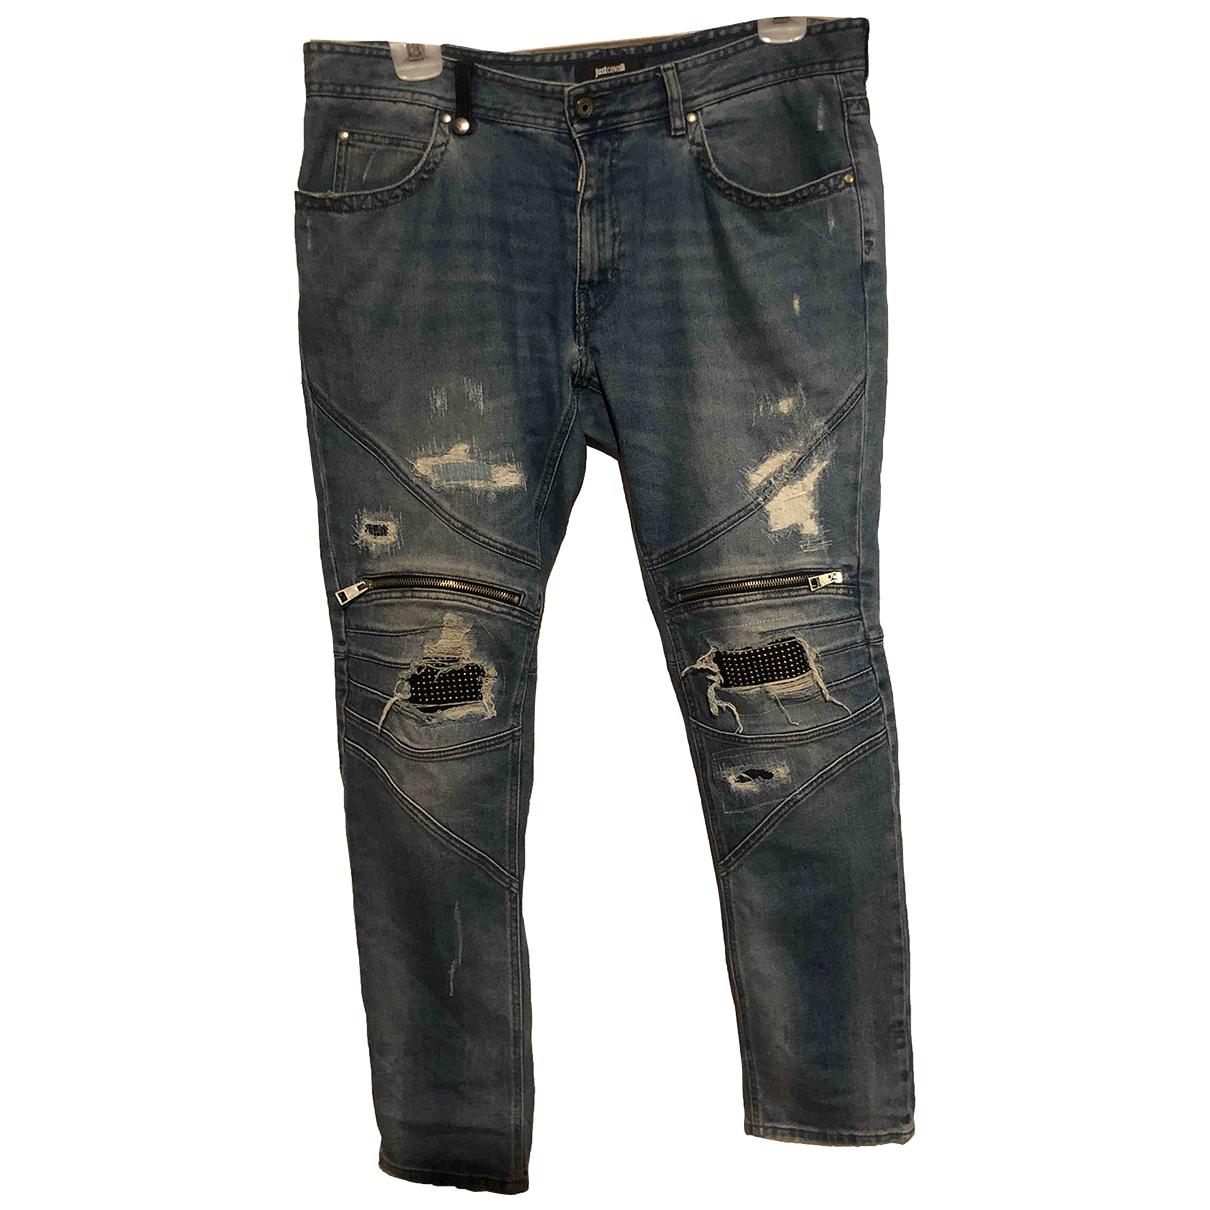 Just Cavalli \N Blue Cotton - elasthane Jeans for Men 34 US